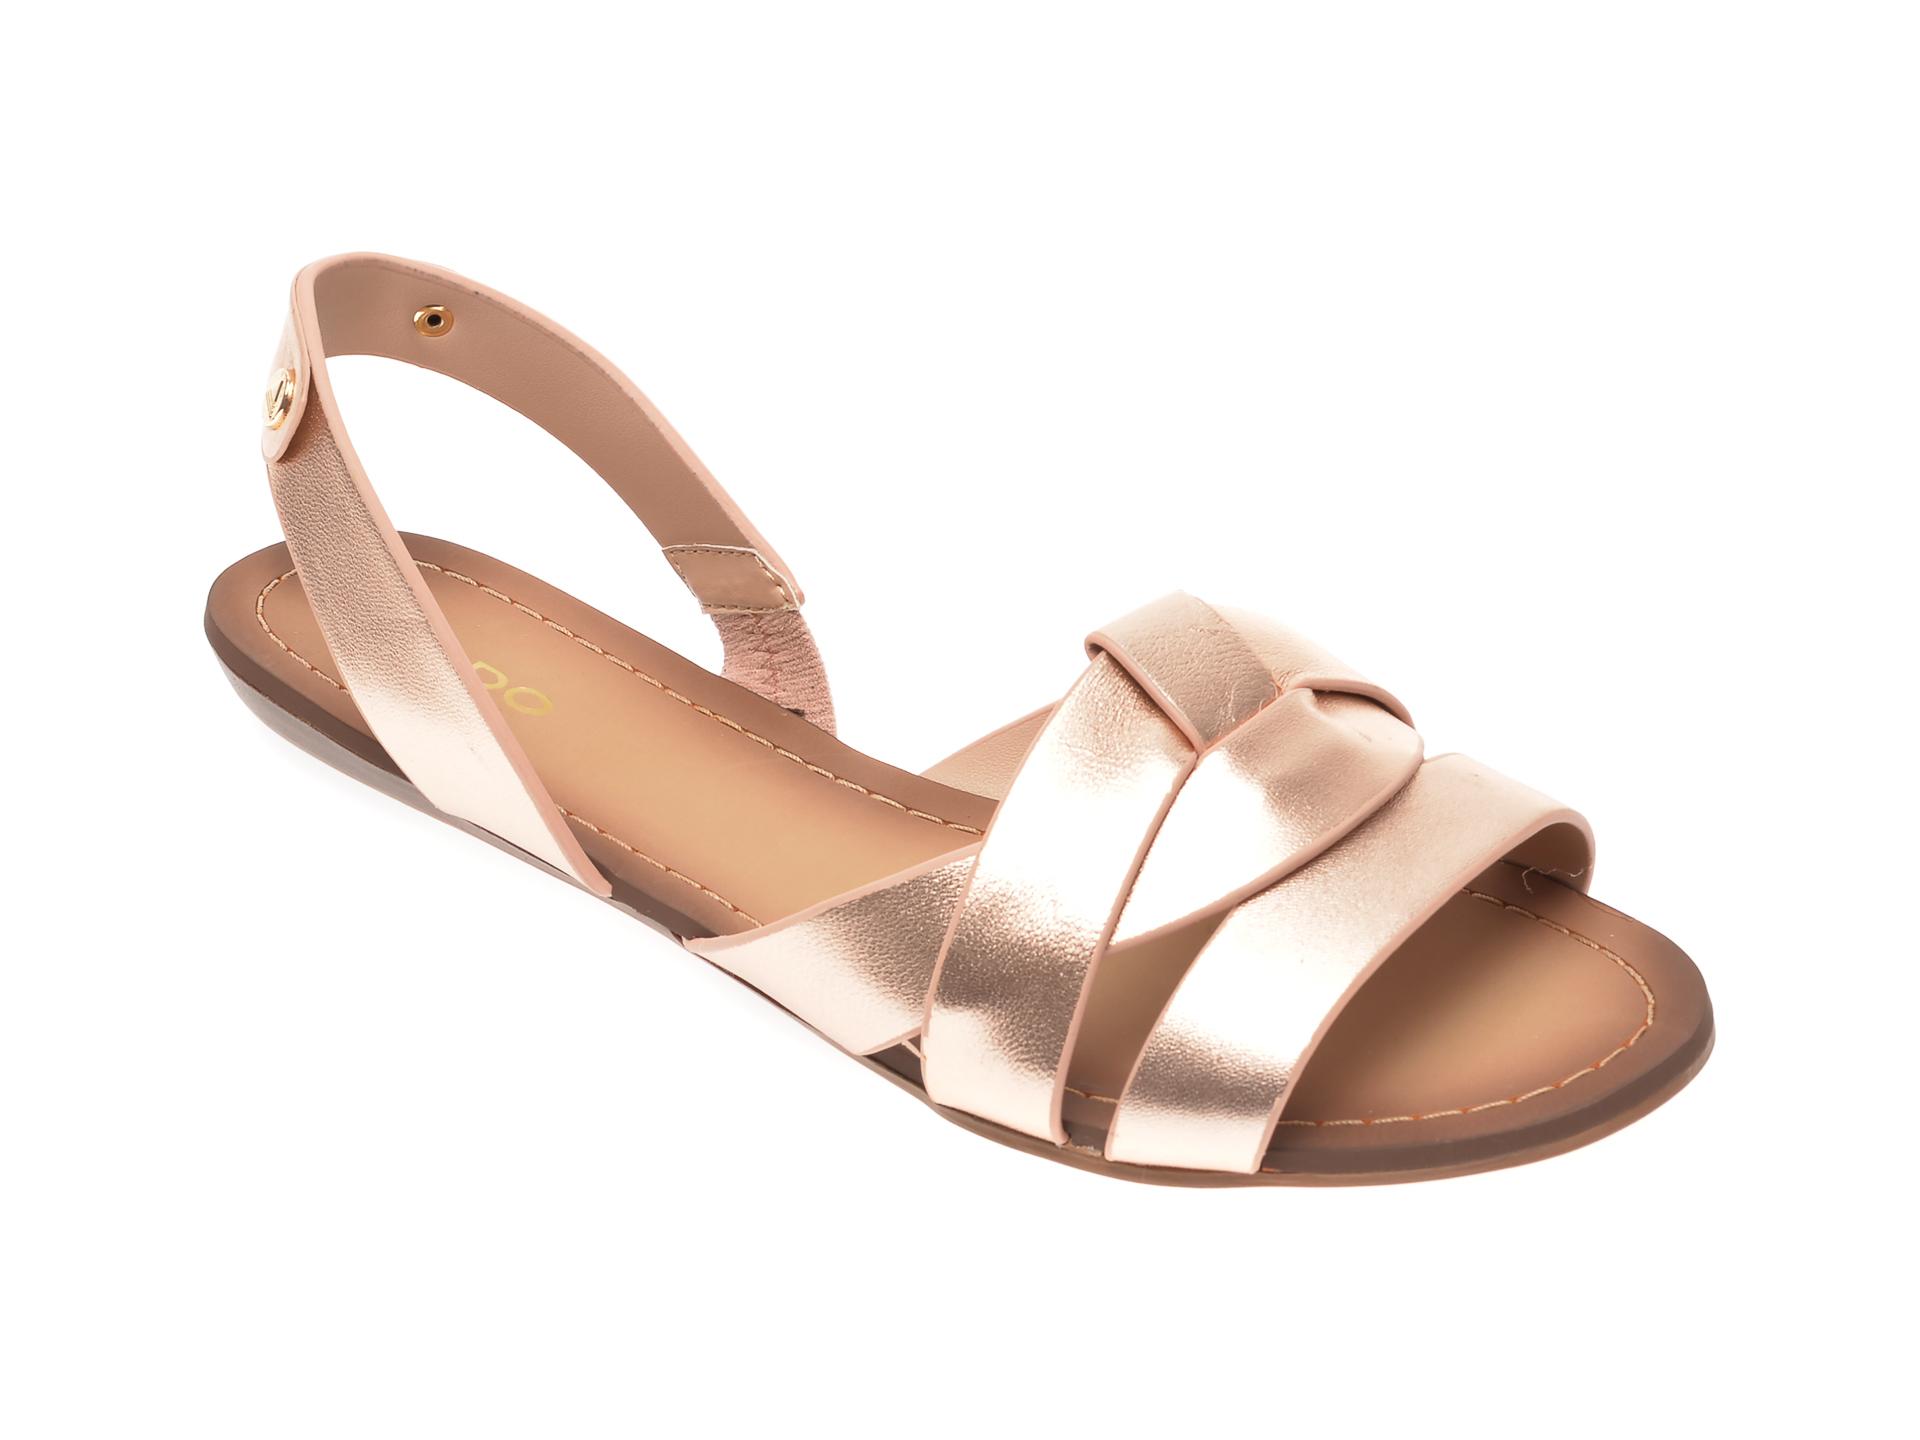 Sandale ALDO aurii, Deladriewiel962, din piele naturala imagine otter.ro 2021